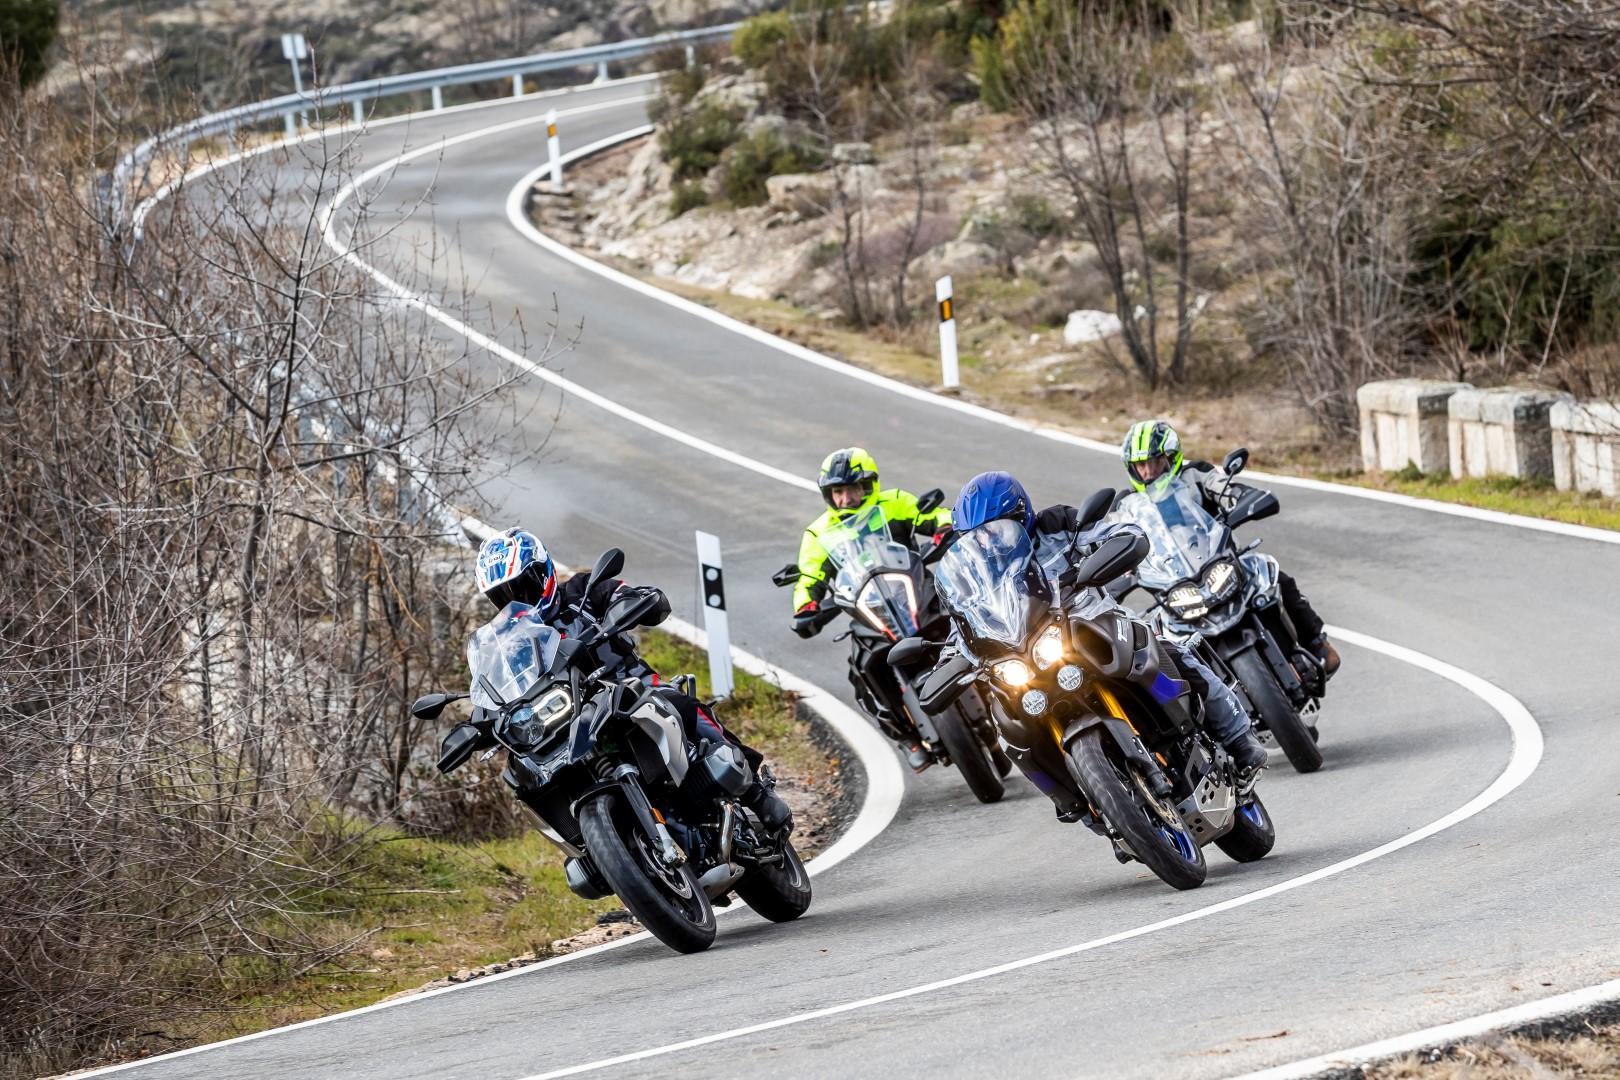 Comparativa maxi trail: BMW R 1250 GS, KTM 1290 Super Adventure S, Triumph Tiger 1200 XCA, Yamaha XT1200ZE Super Ténéré